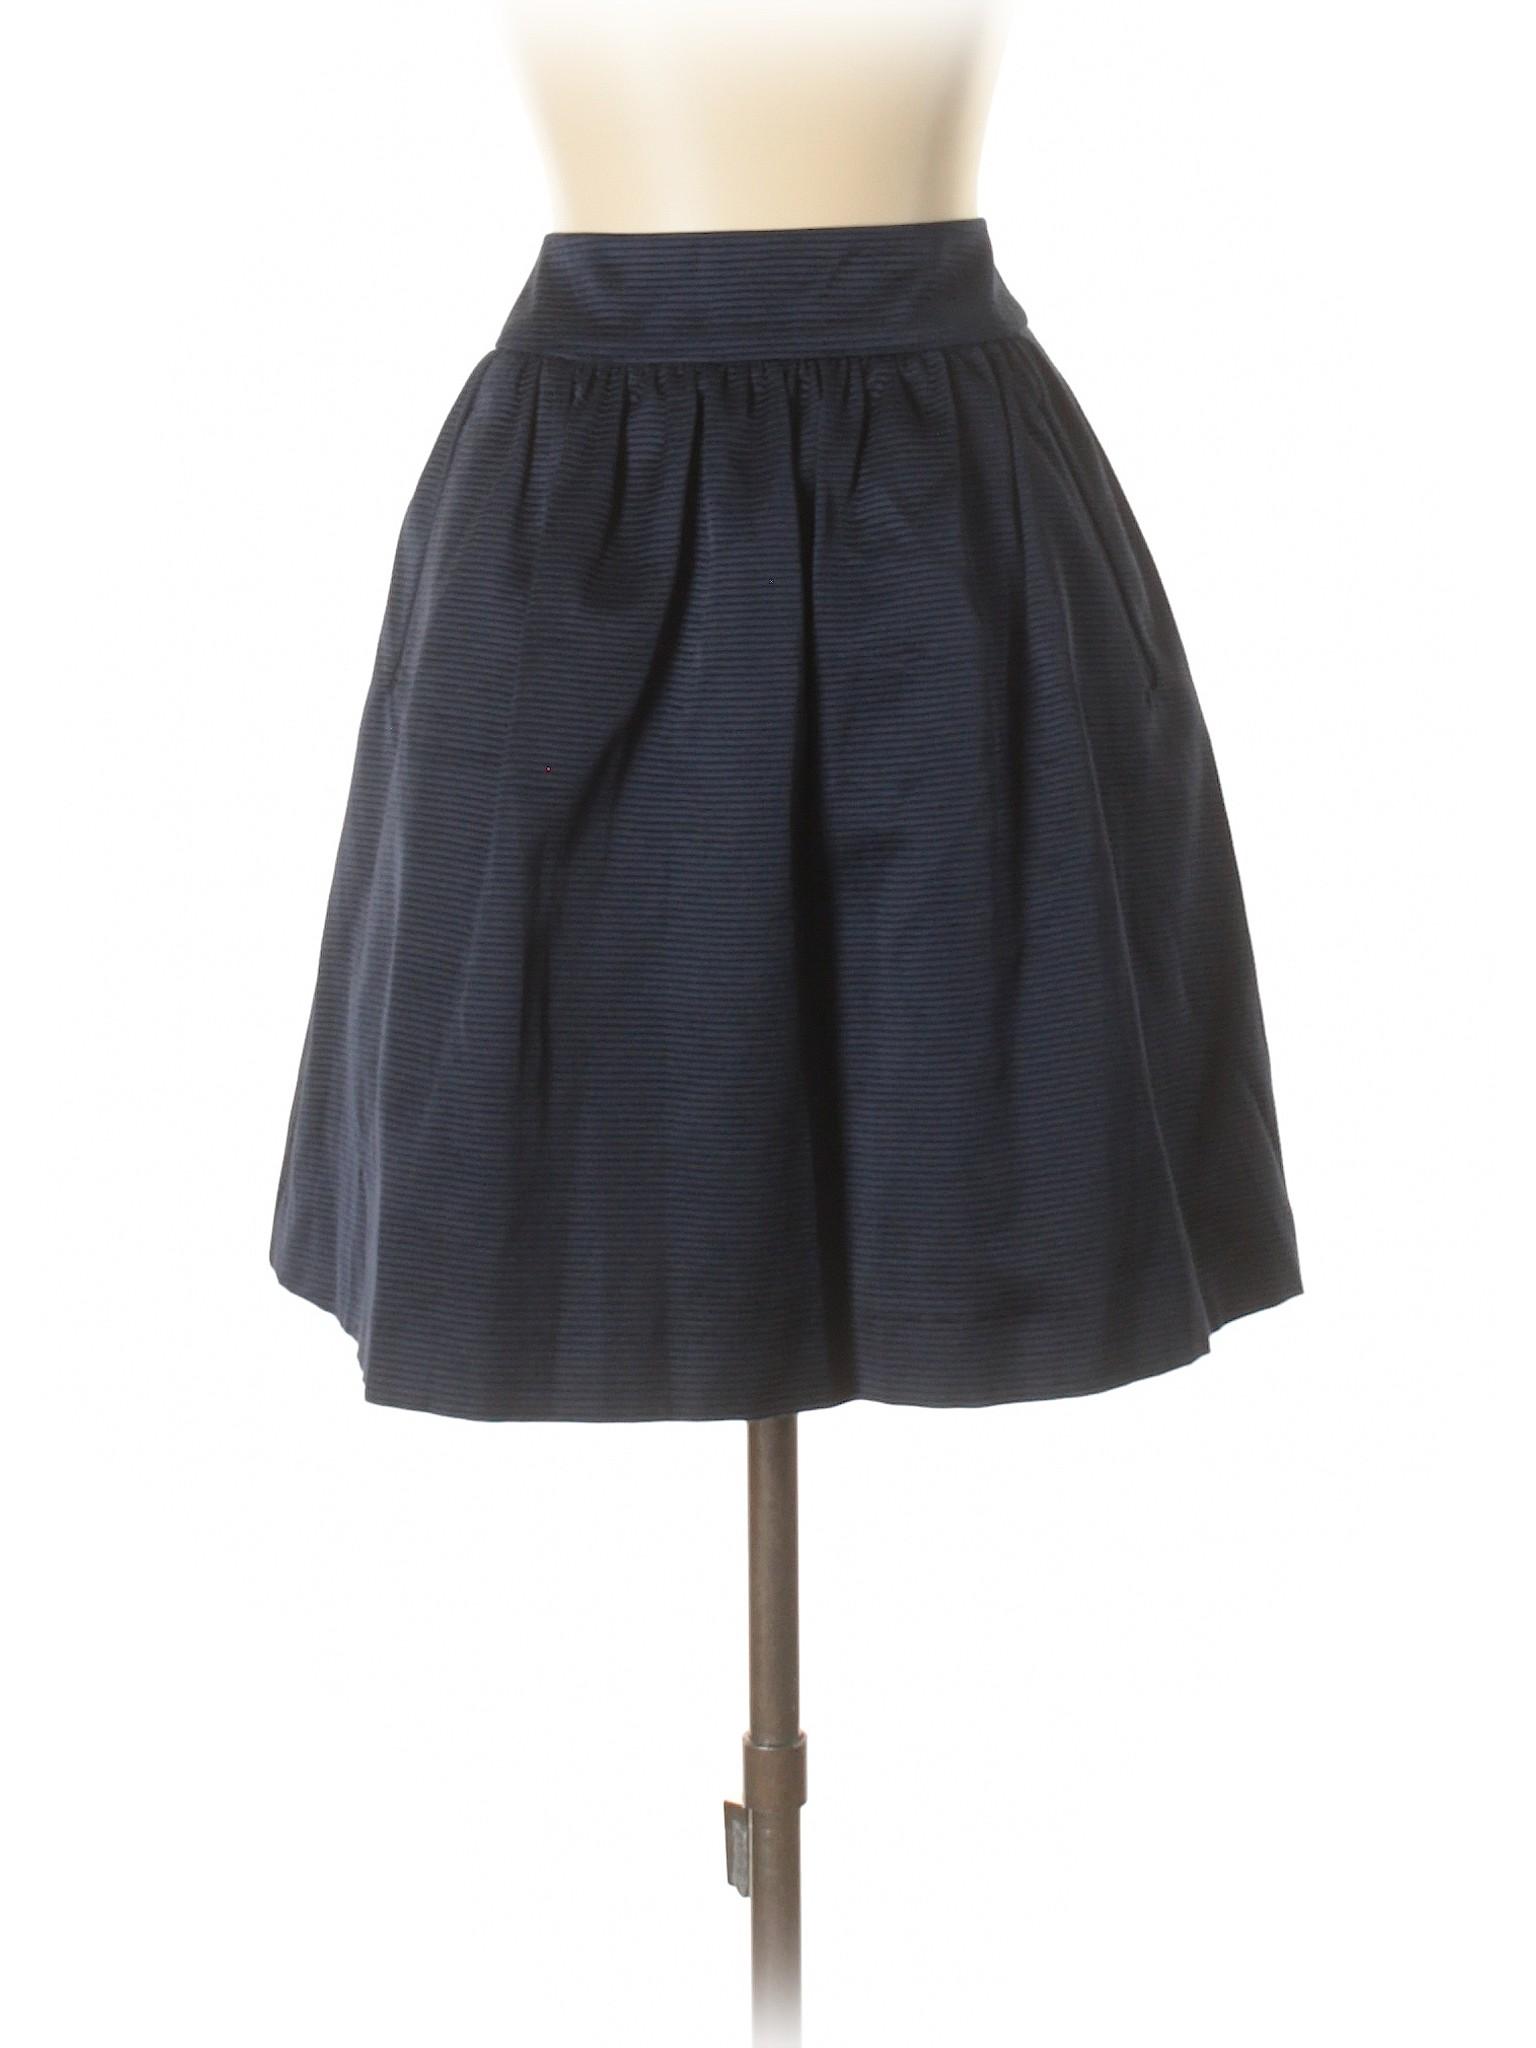 Skirt Boutique Casual Boutique Casual Skirt Skirt Boutique Casual Casual Skirt Boutique wqpCO